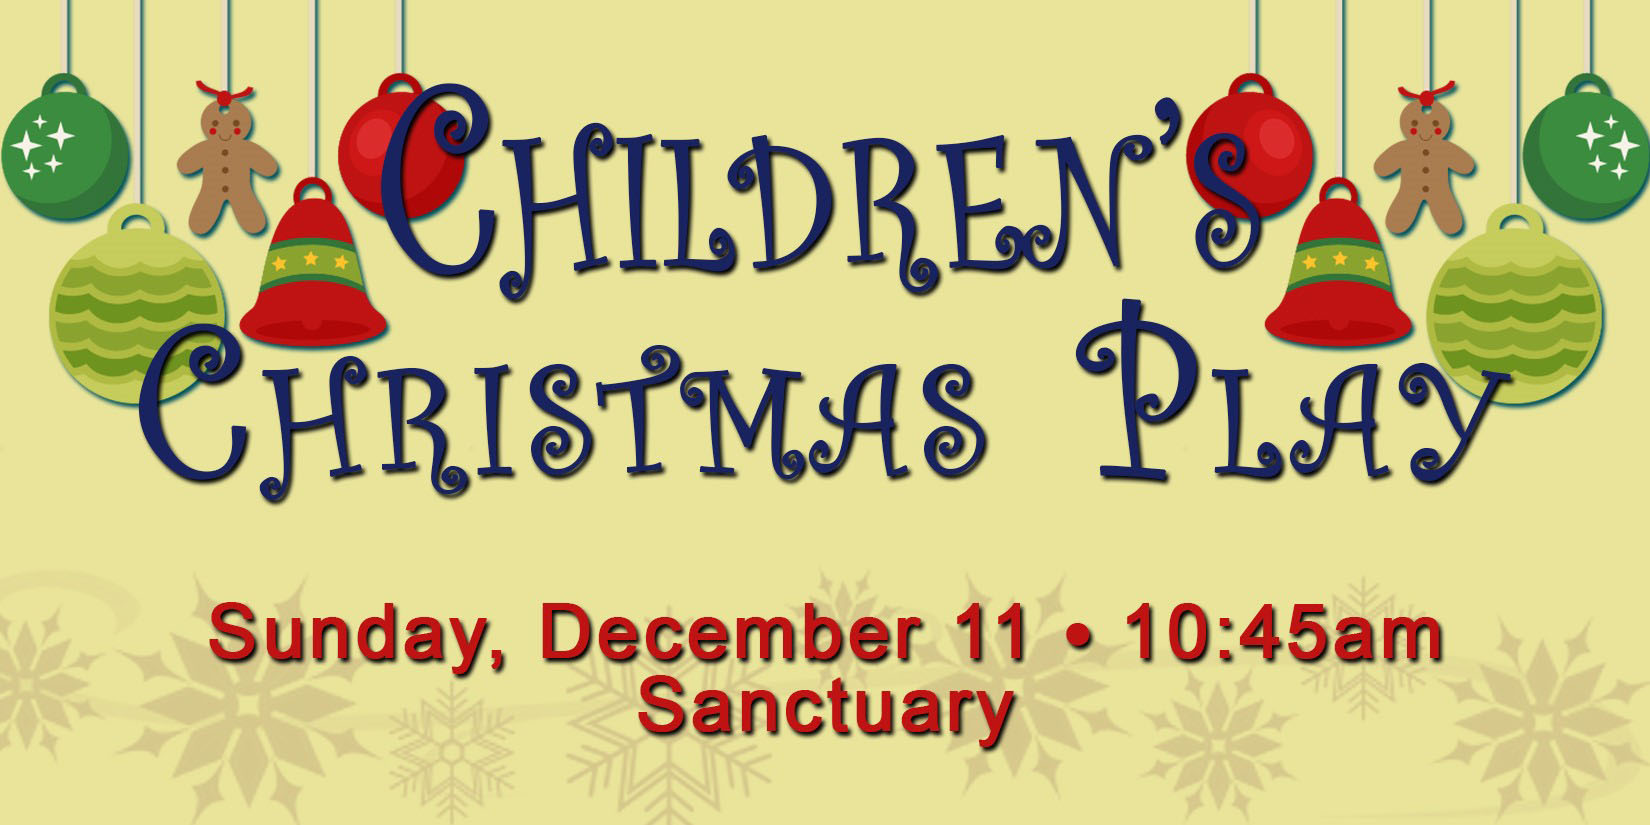 Brentwood Baptist Church – Children's Christmas Play